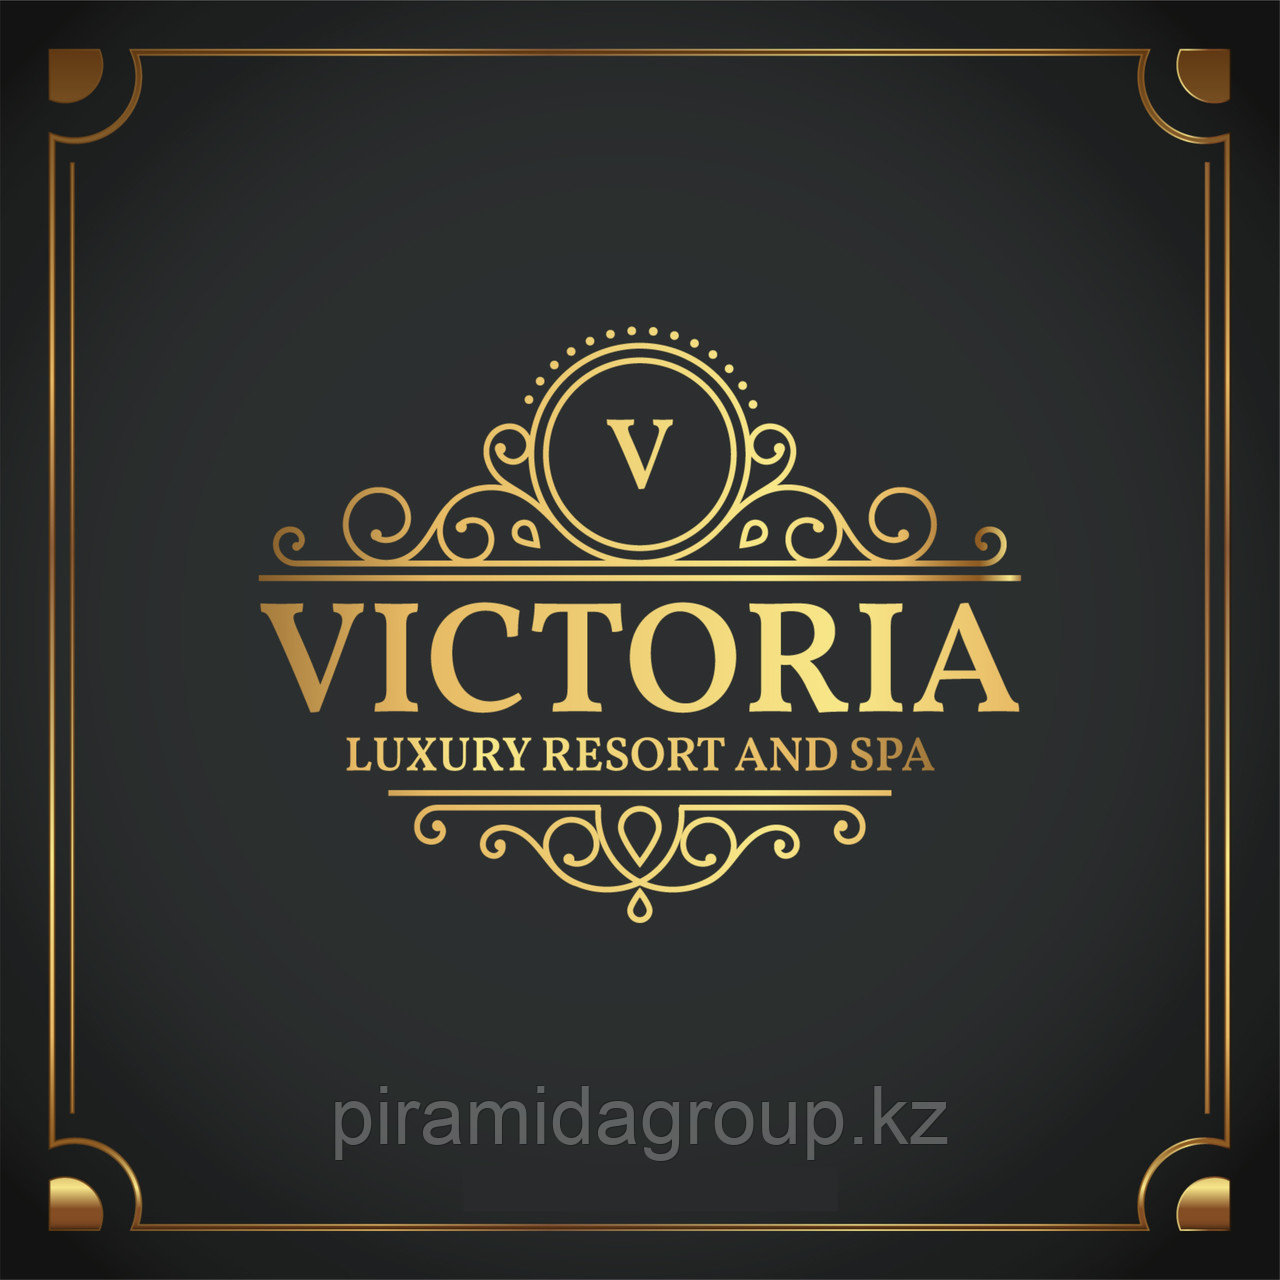 Разработка макета логотипа